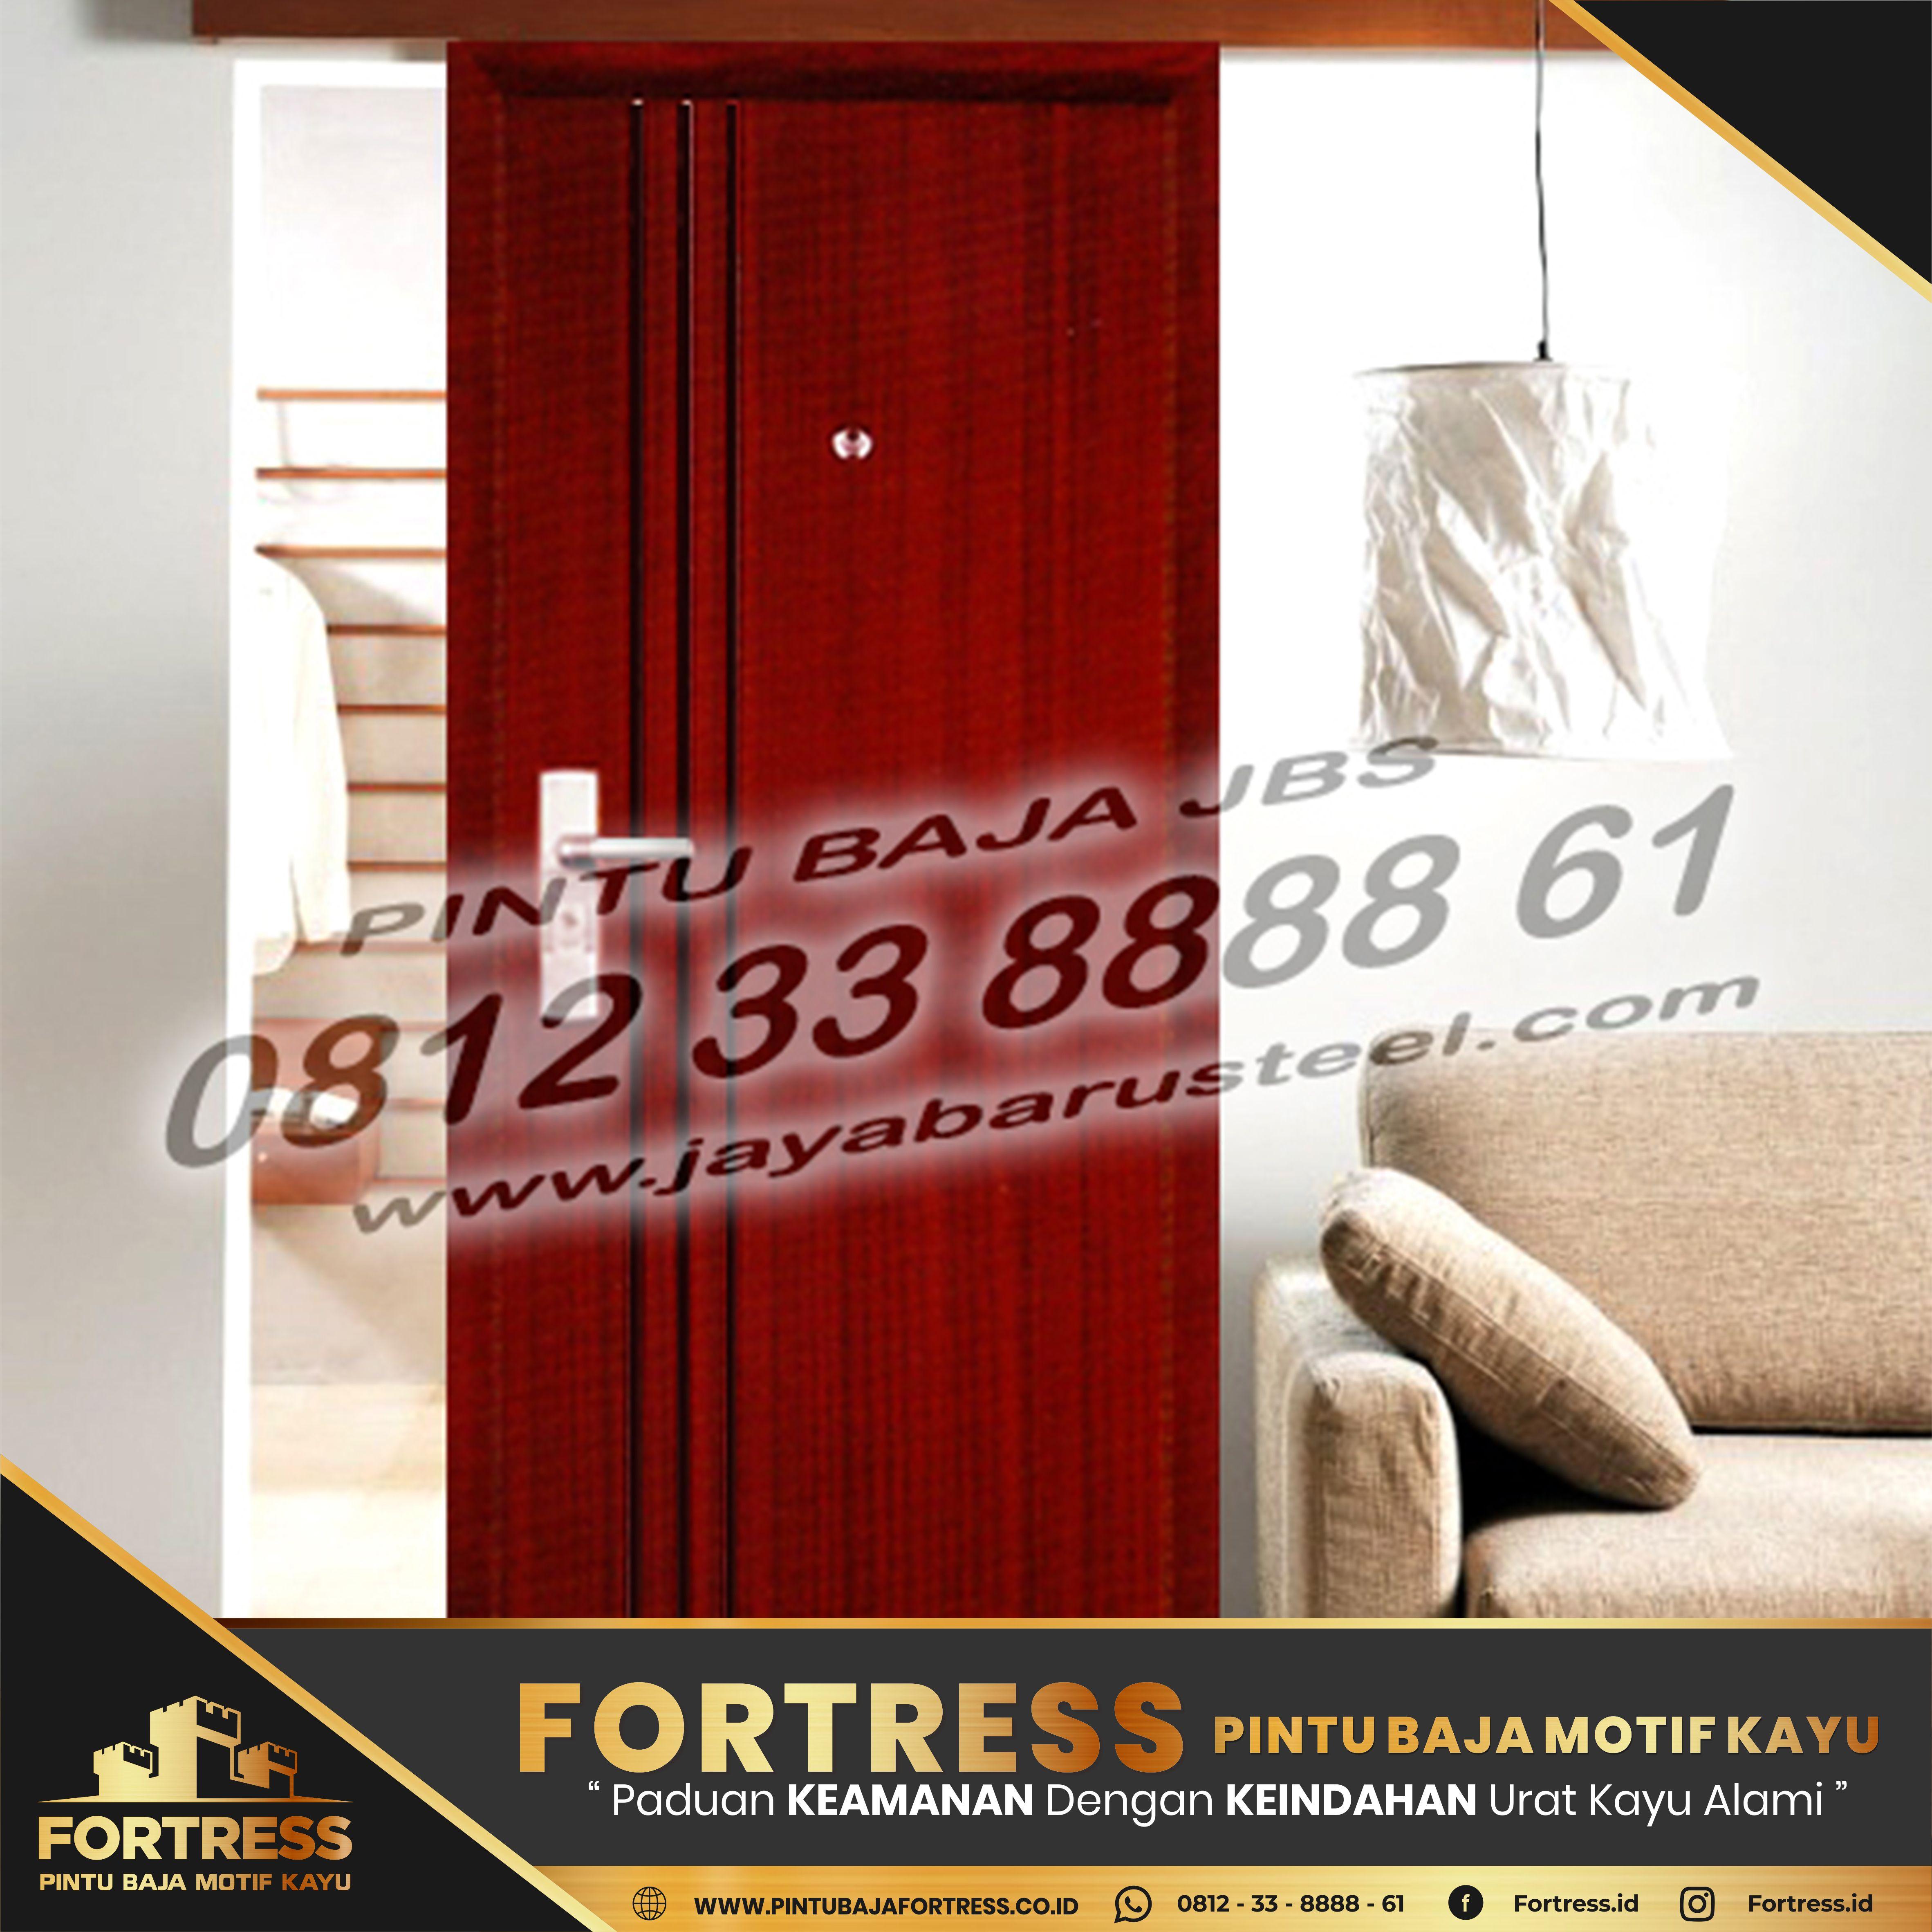 0812-91-6261-07 (FORTRESS) Pekan Baru Steel Door Company